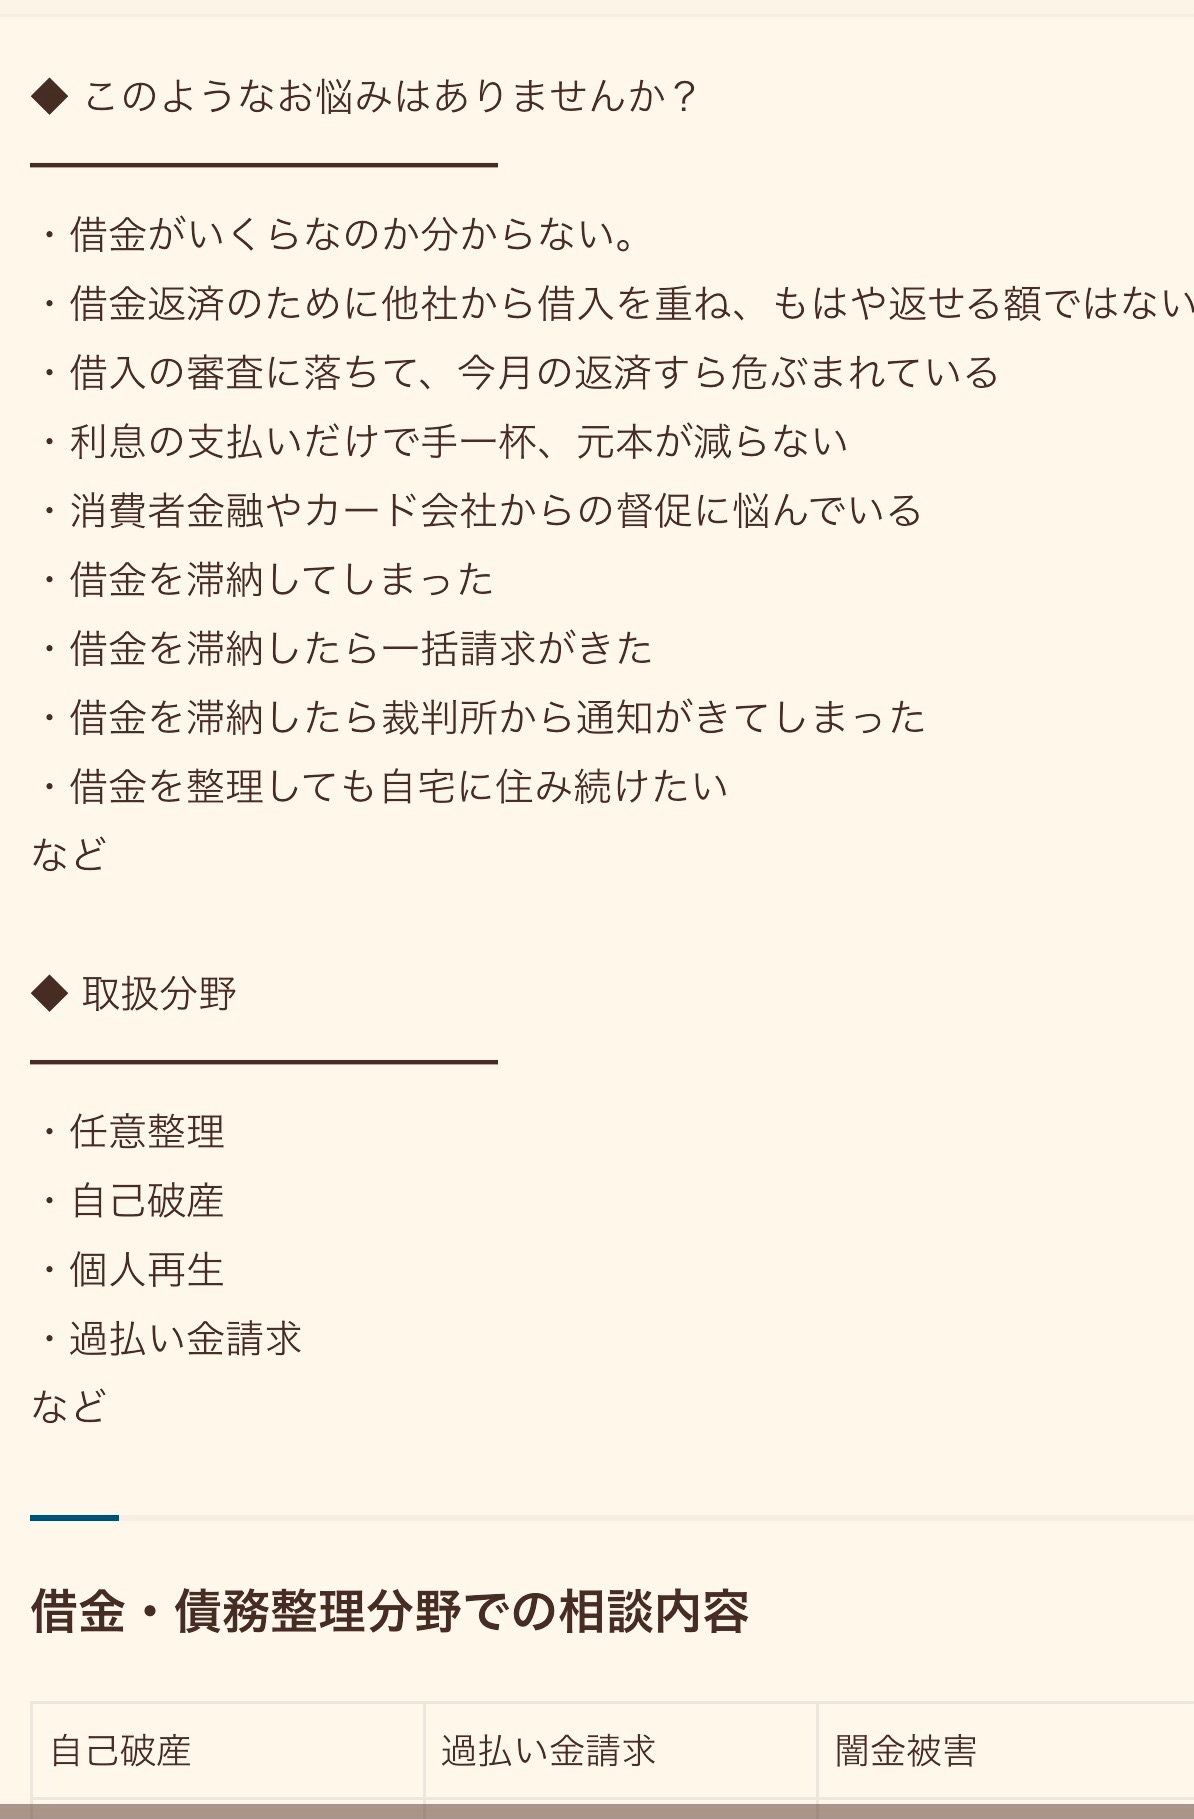 f:id:kagaribi-kotsujiko:20210122225705j:plain